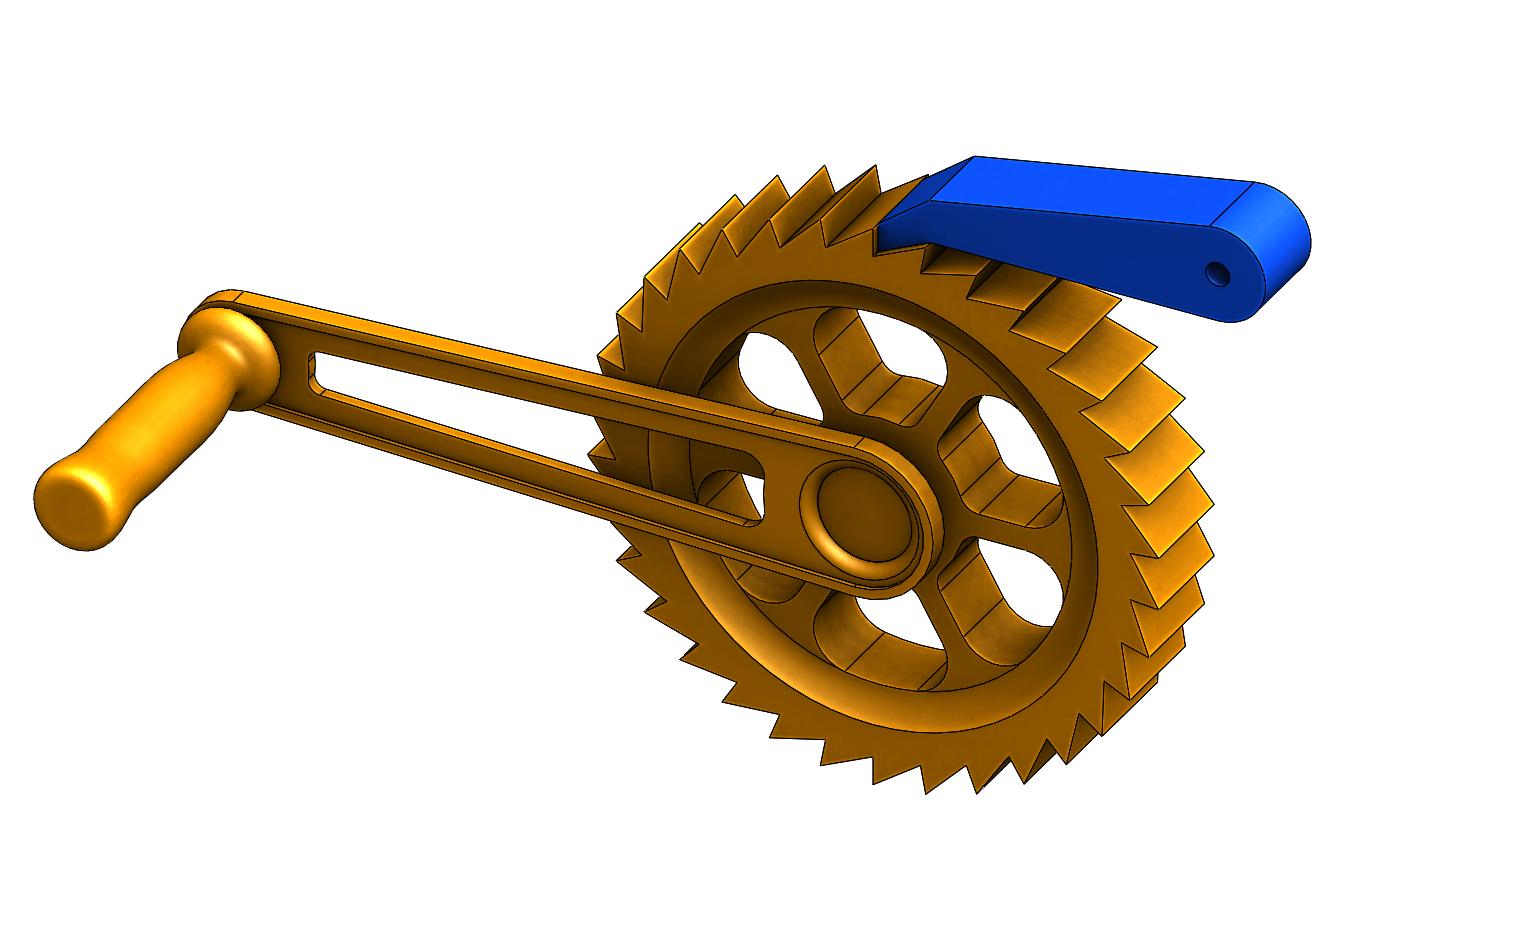 mecanism